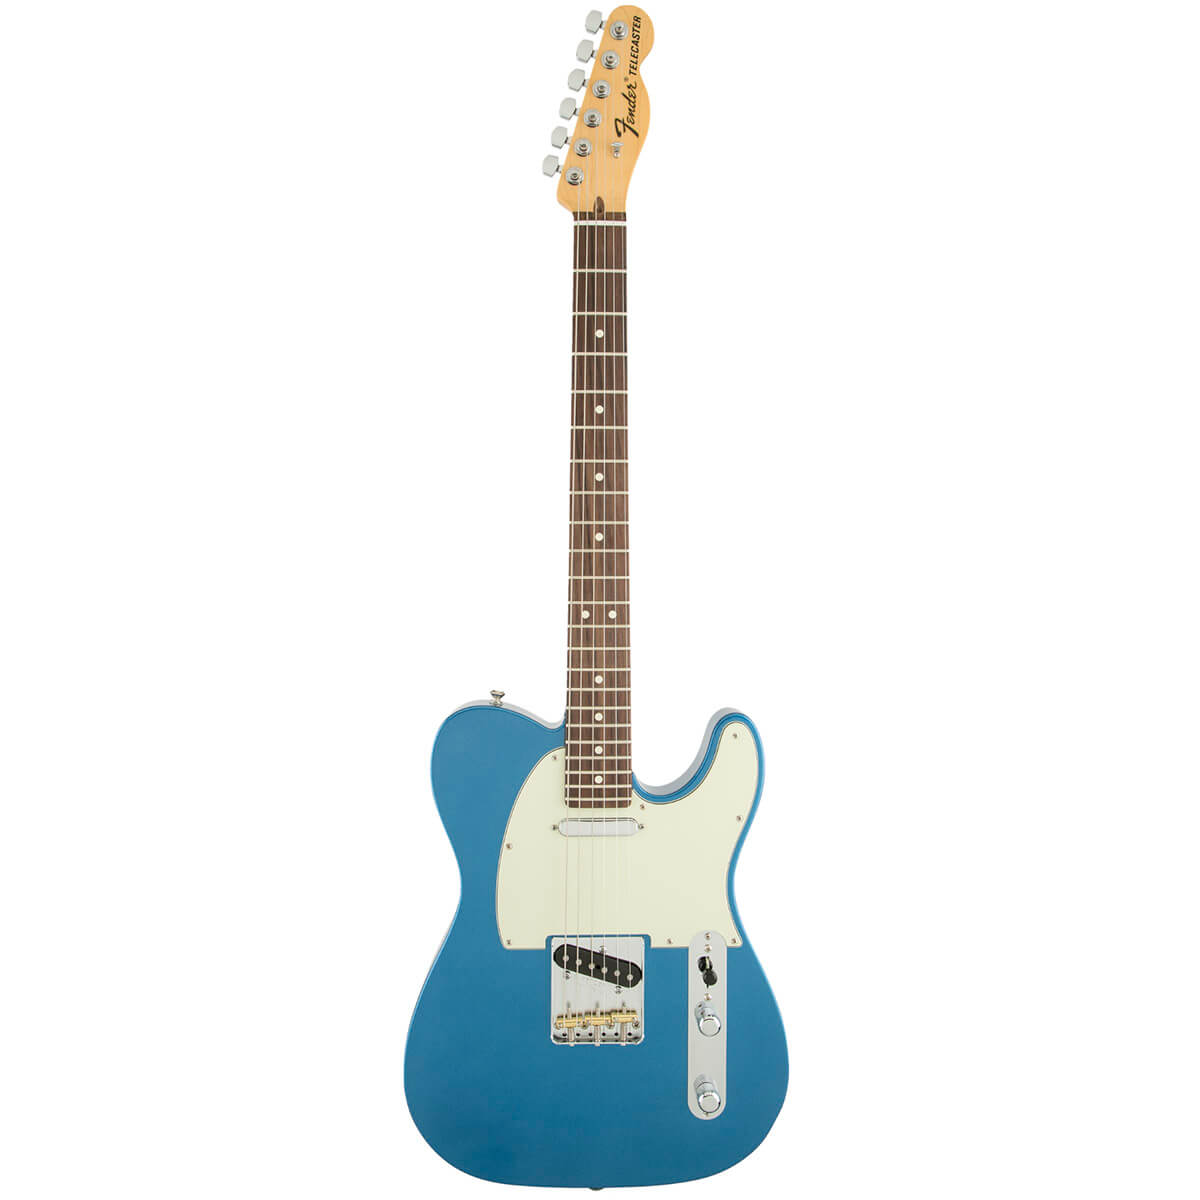 Fender AmericanSpecialTelecaster,RW,LPB el-guitar lakeplacidblue